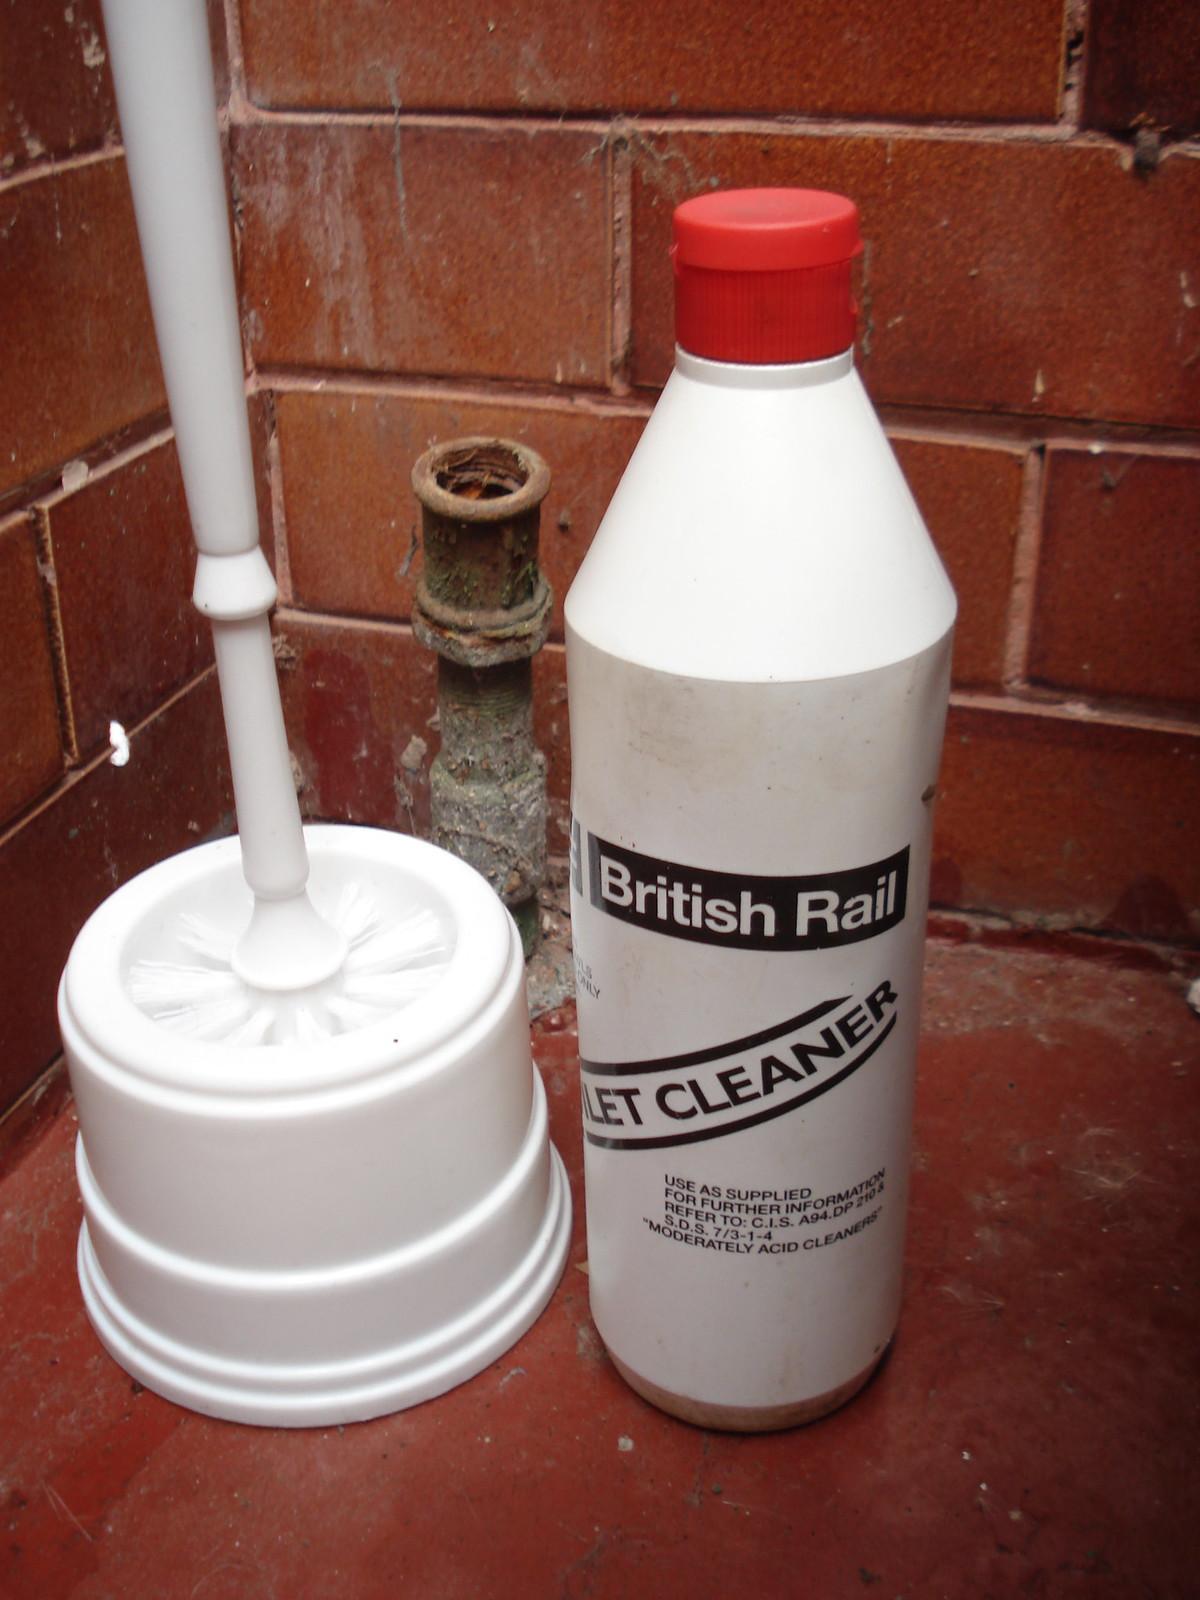 Vintage British Rail toilet cleaner